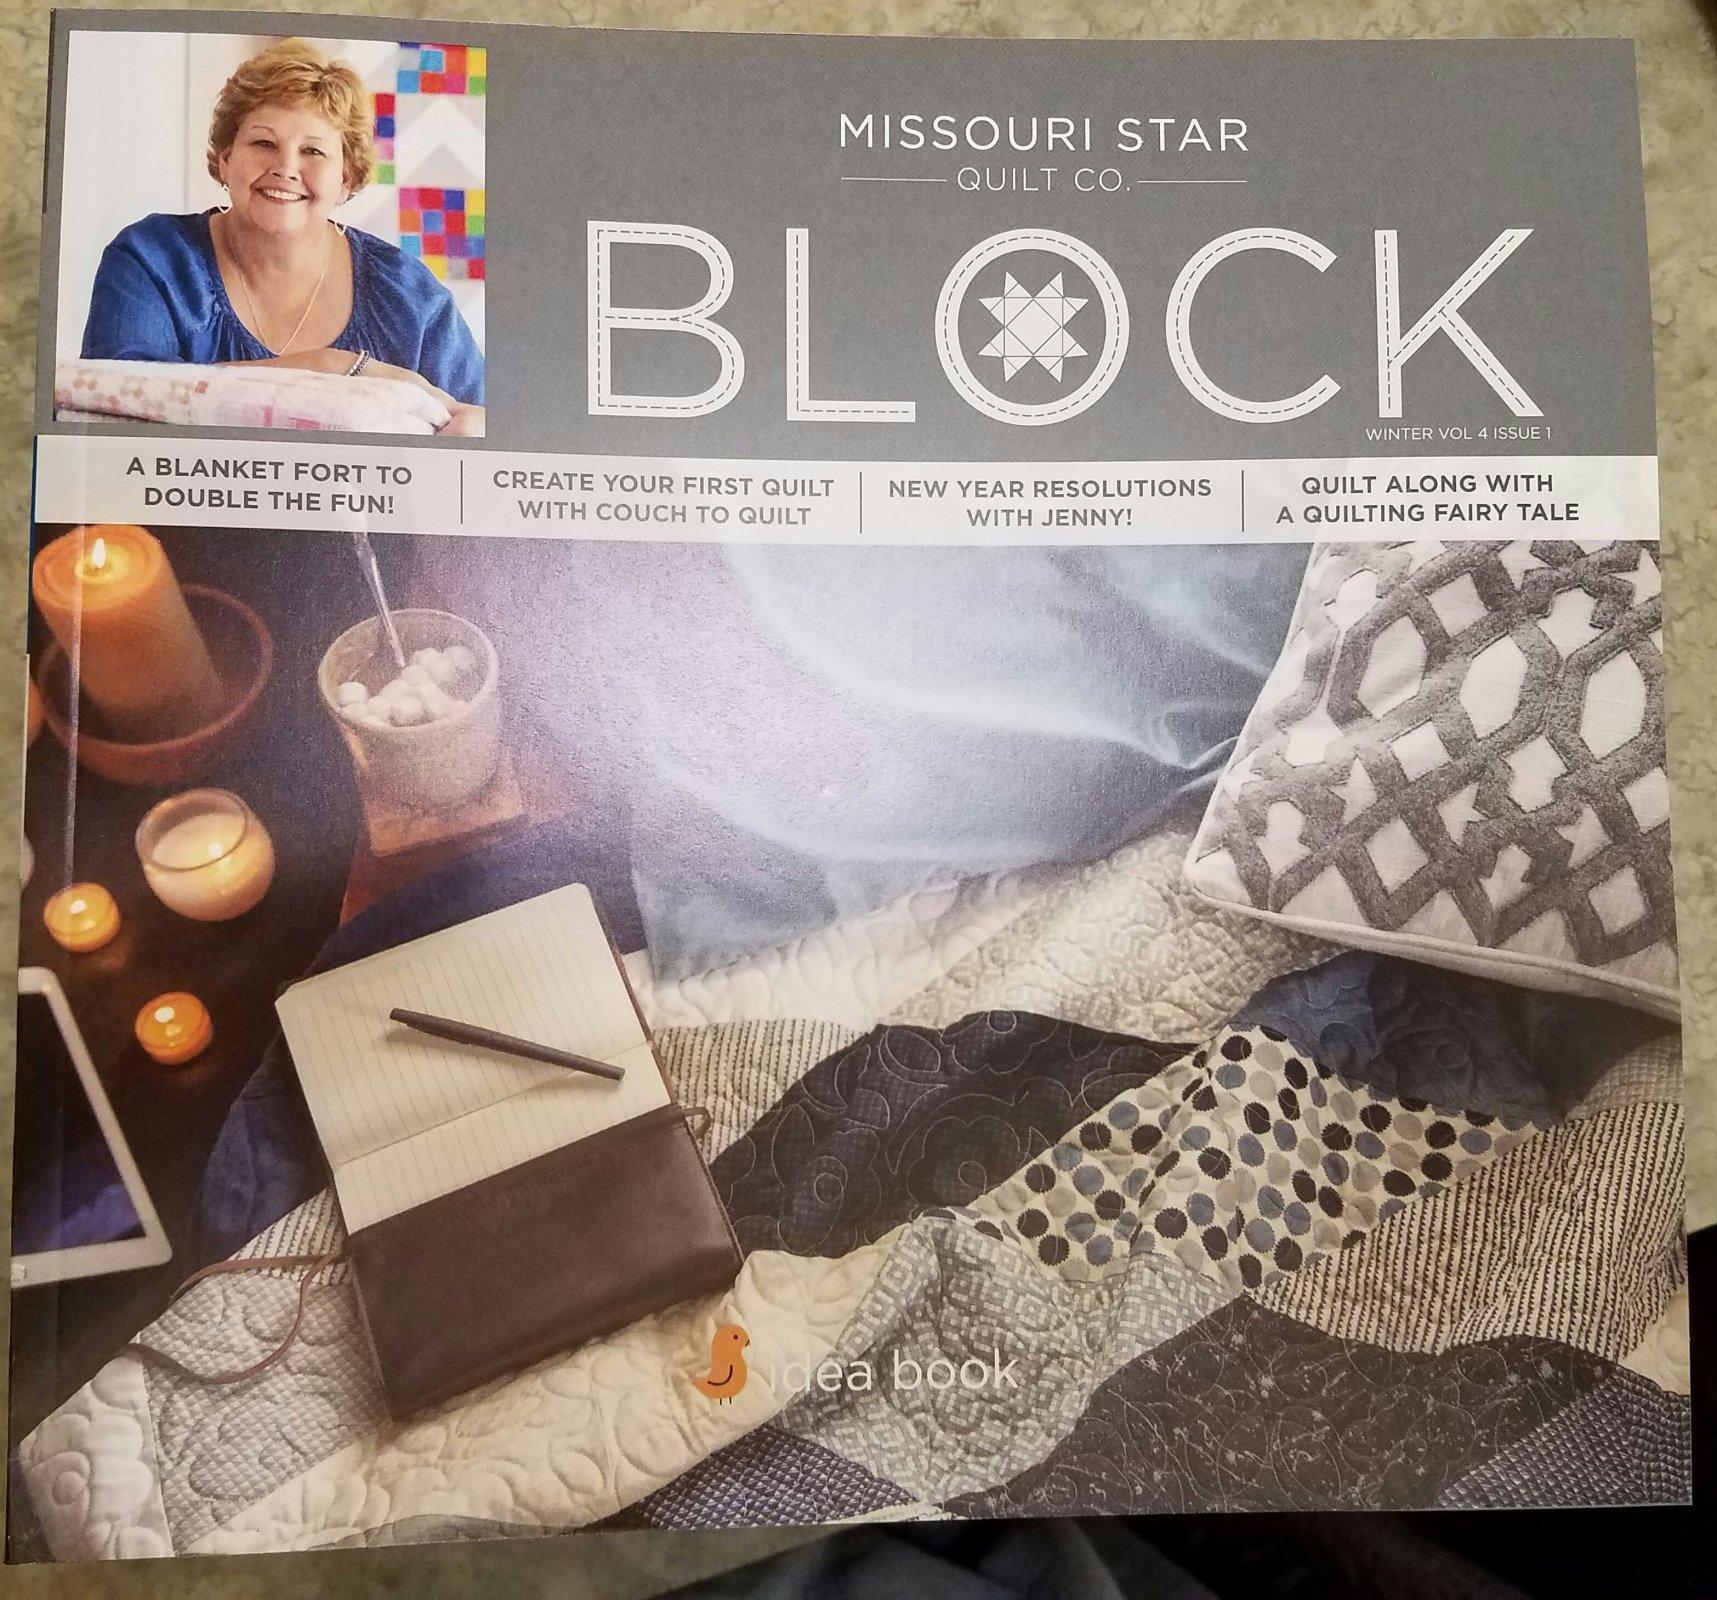 Missouri Star Block Idea Book Winter 2016